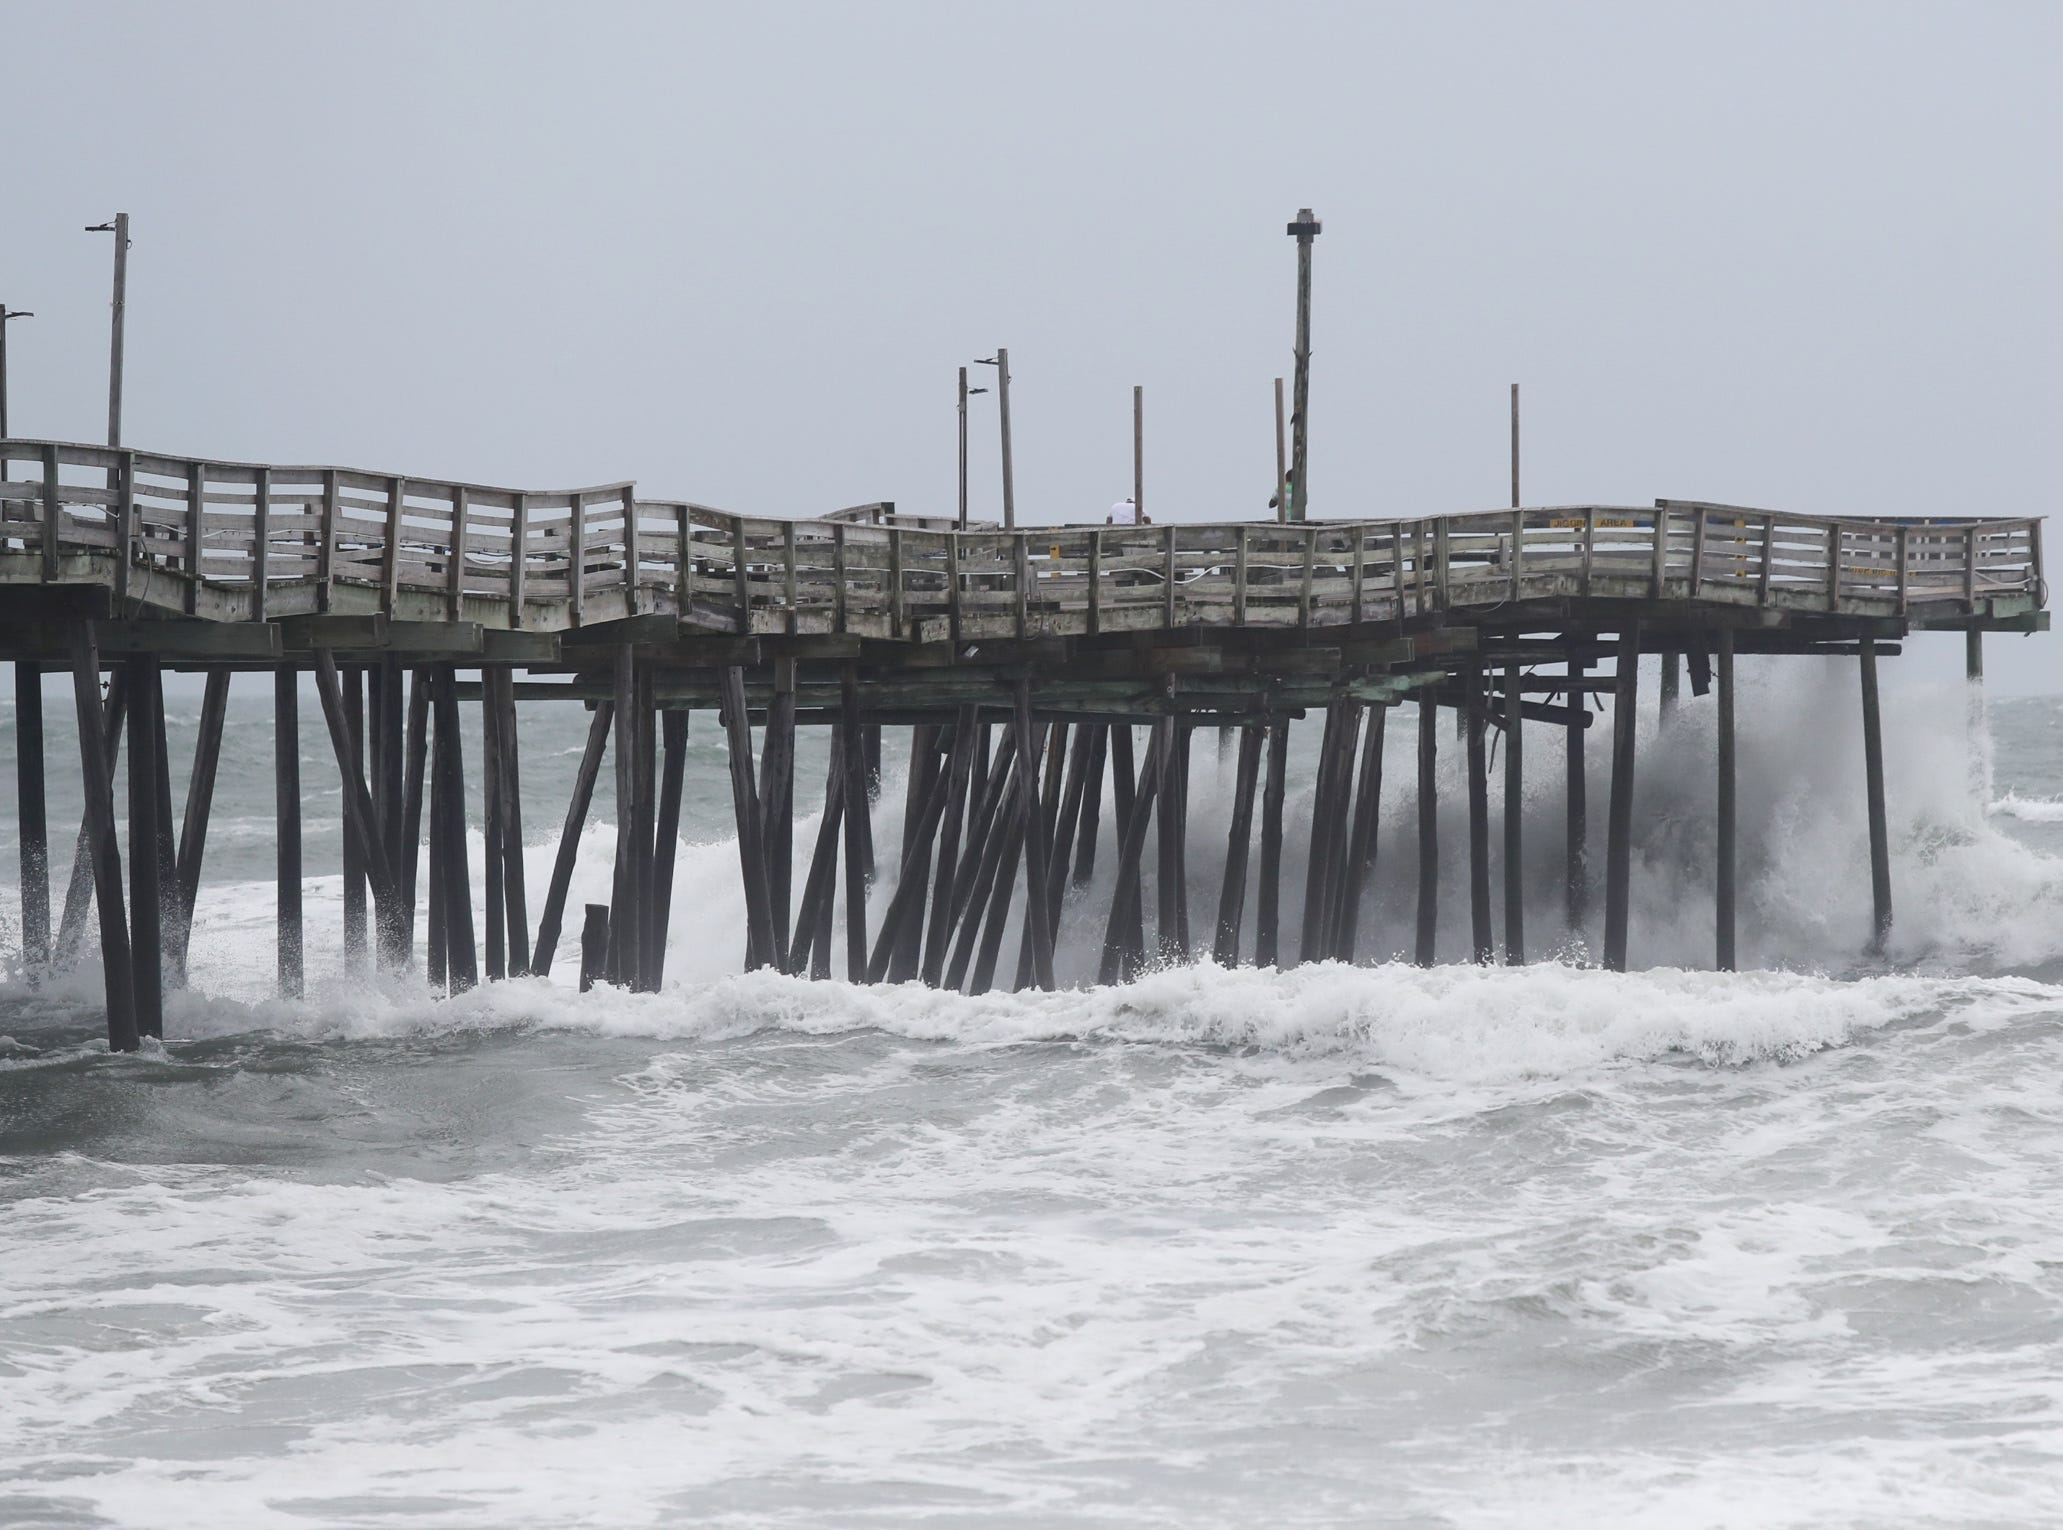 September 14, 2018; Kill Devil Hills, NC, USA; The waves hit the Avalon Fishing Pier in Kill Devil Hills, North Carolina on Friday, September 14, 2018.